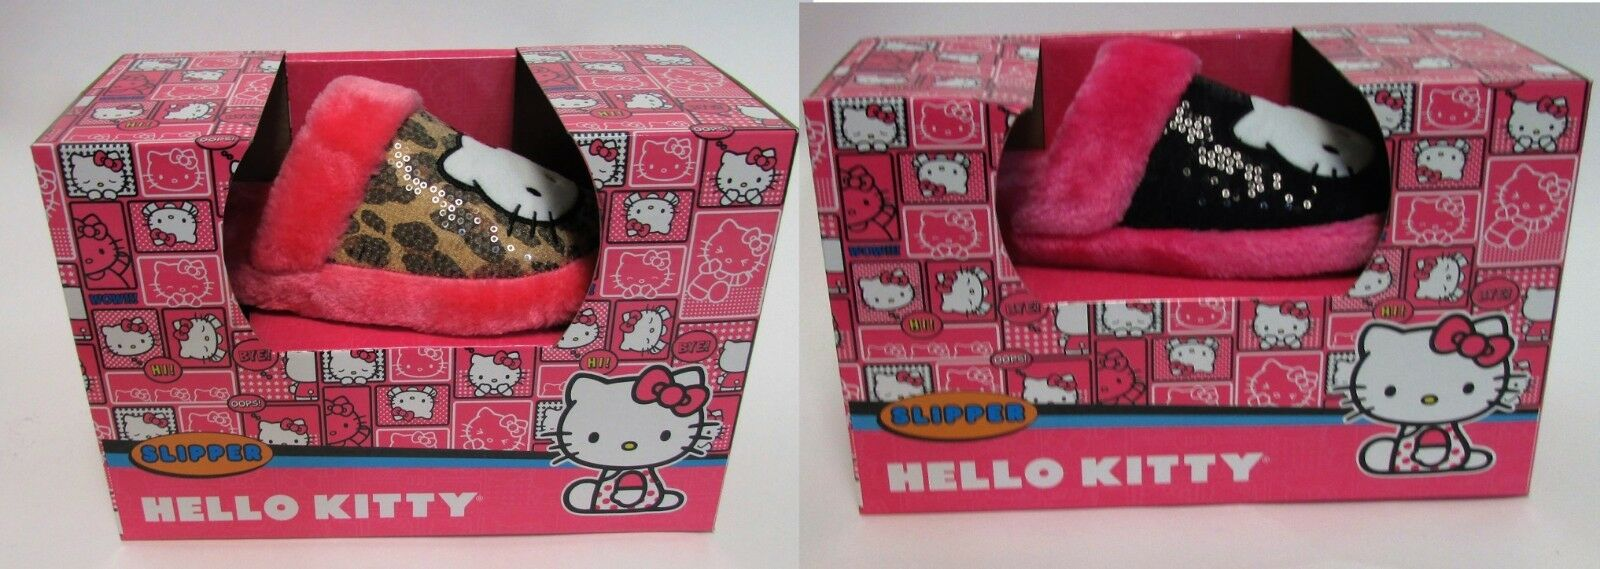 Hello Kitty Sanrio Sequin Slippers Pink Black, Pink Animal Print NIB Sz 5/6, 7/8